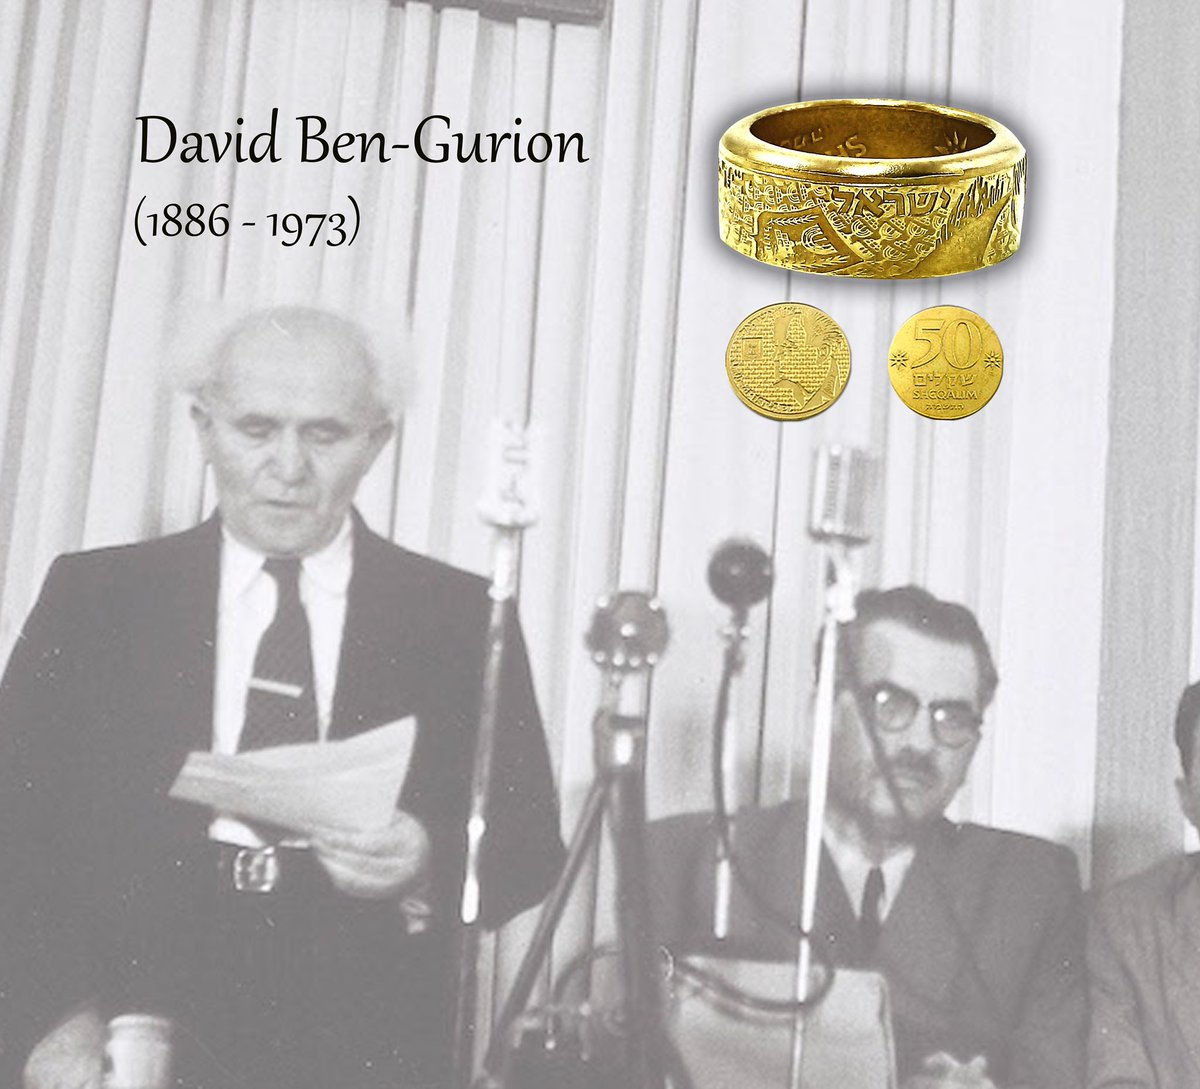 A leader, a visionary, a builder. Check out David Ben Gurion Coin Ring #Israel #Handmade #Zion #Jewish Lira Vintage #Judaica  https://www.ebay.com/ulk/itm/173375860010… @eBay